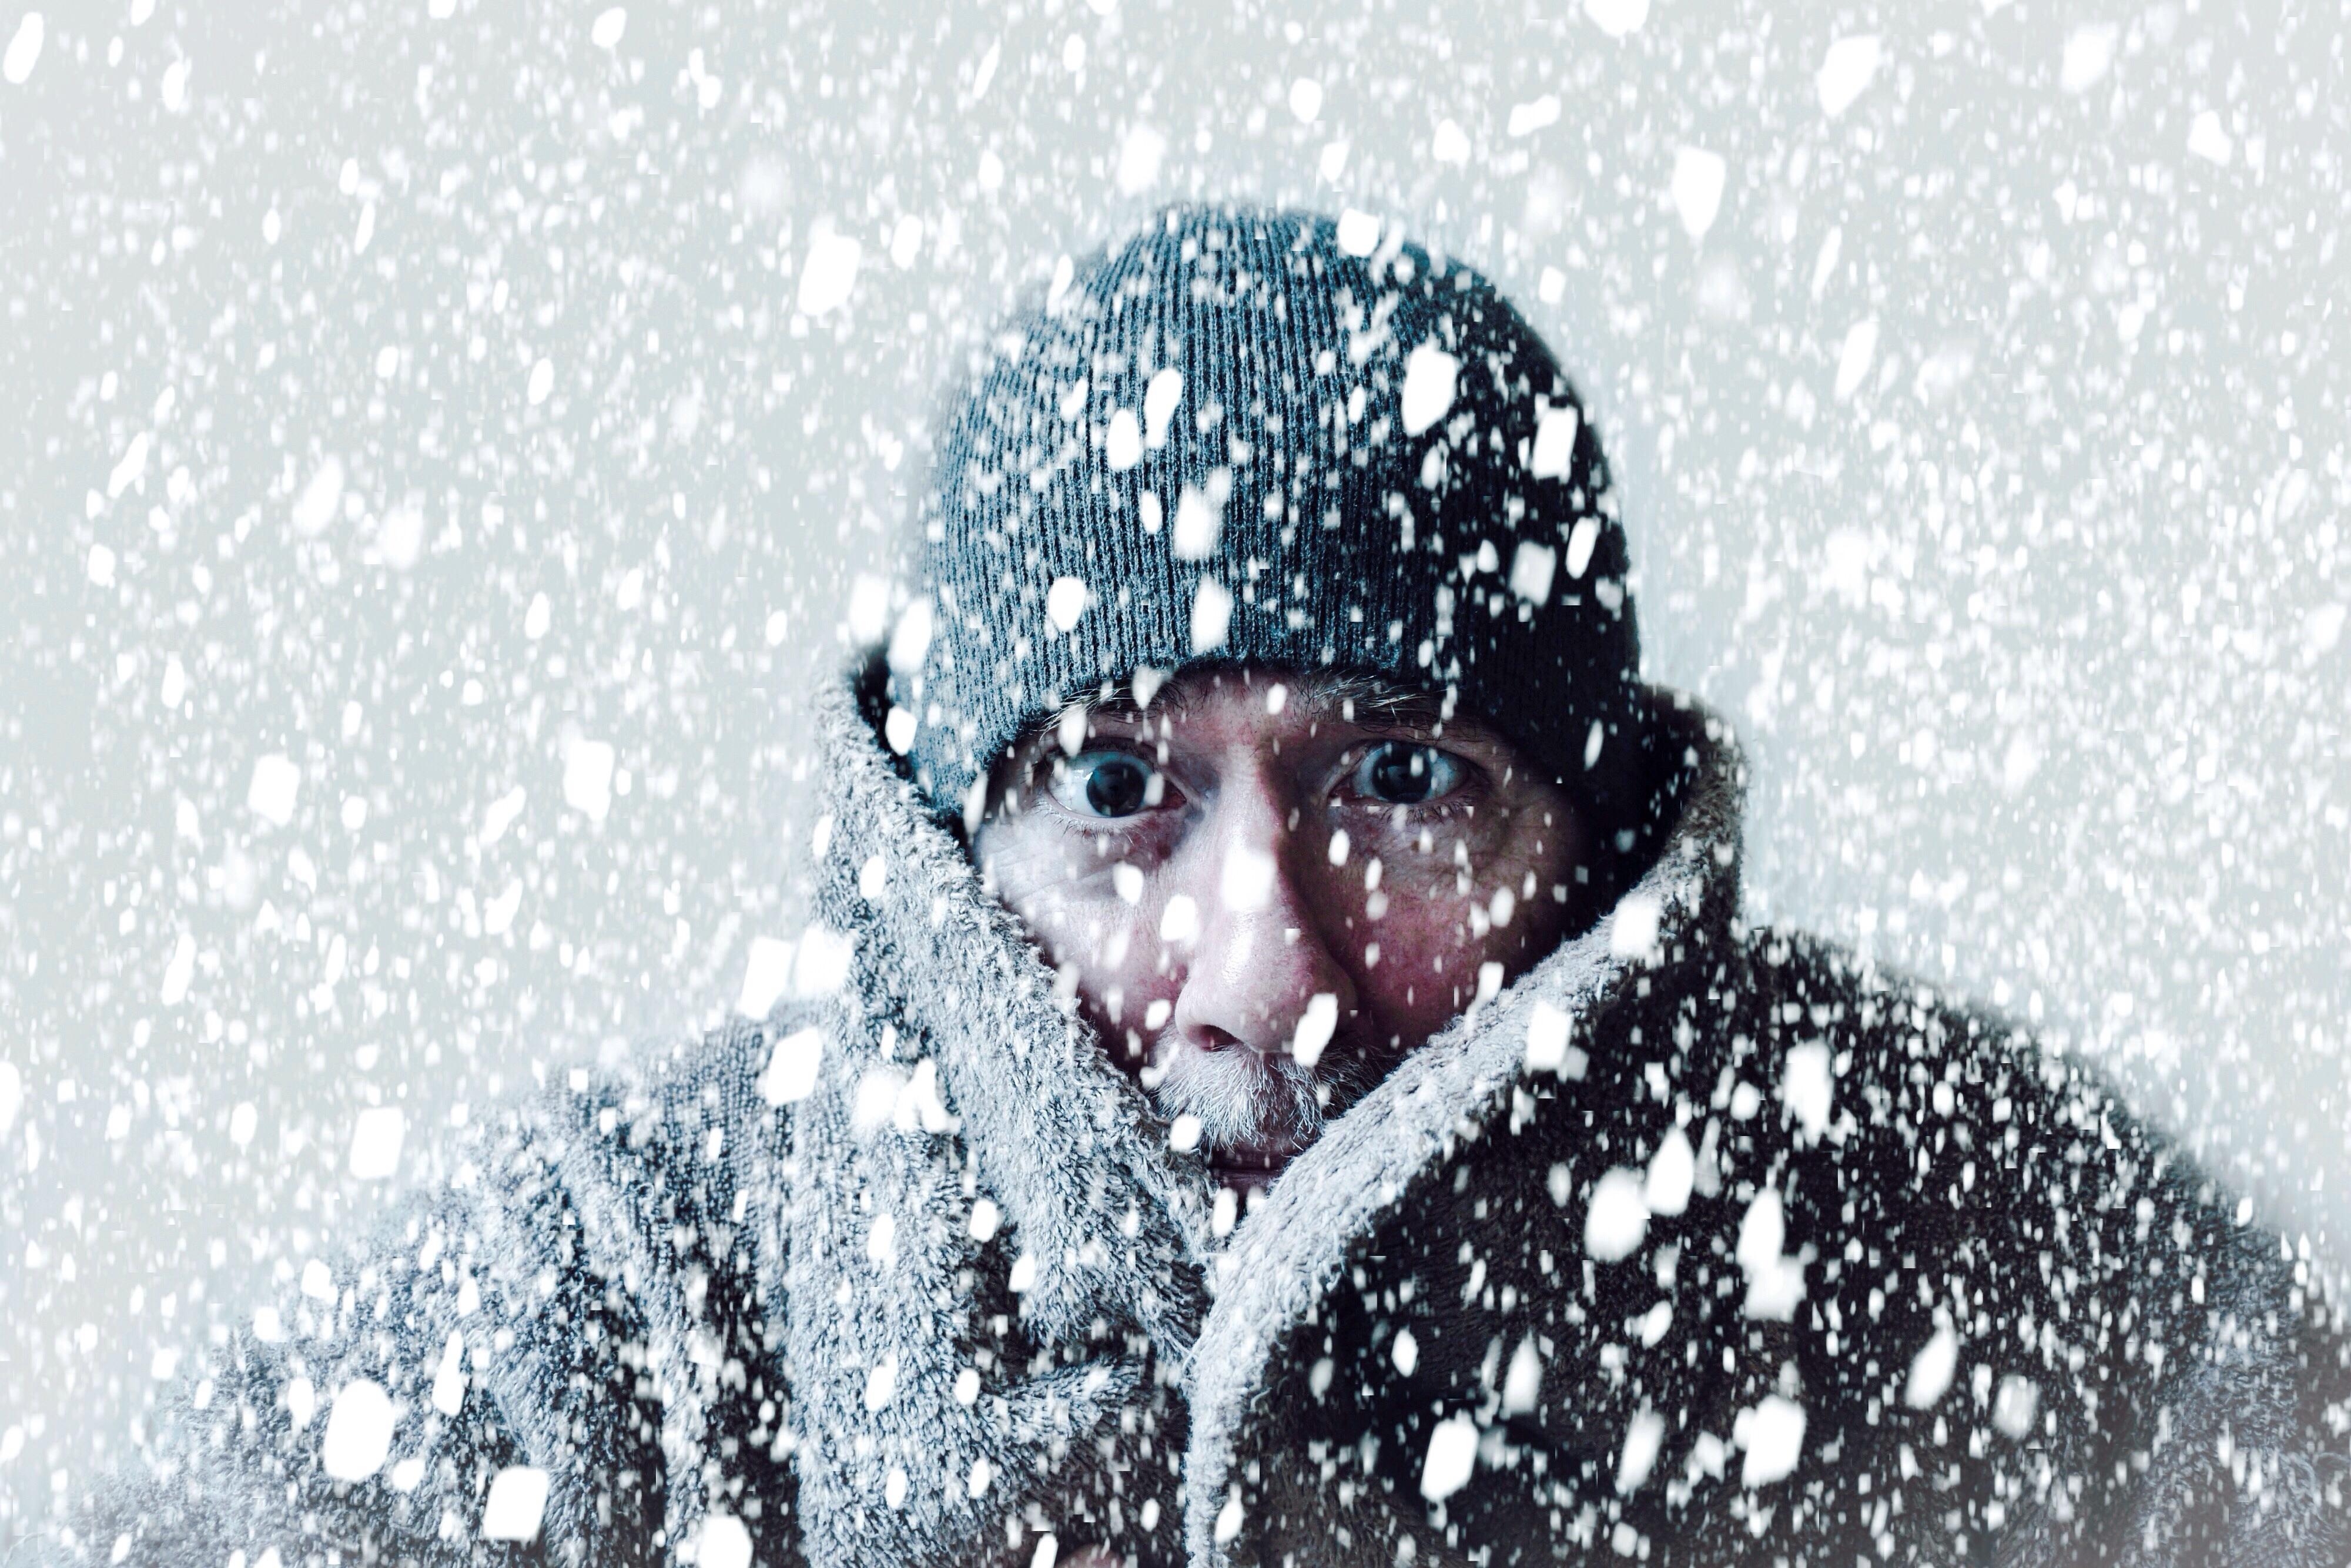 Snowstorm stock